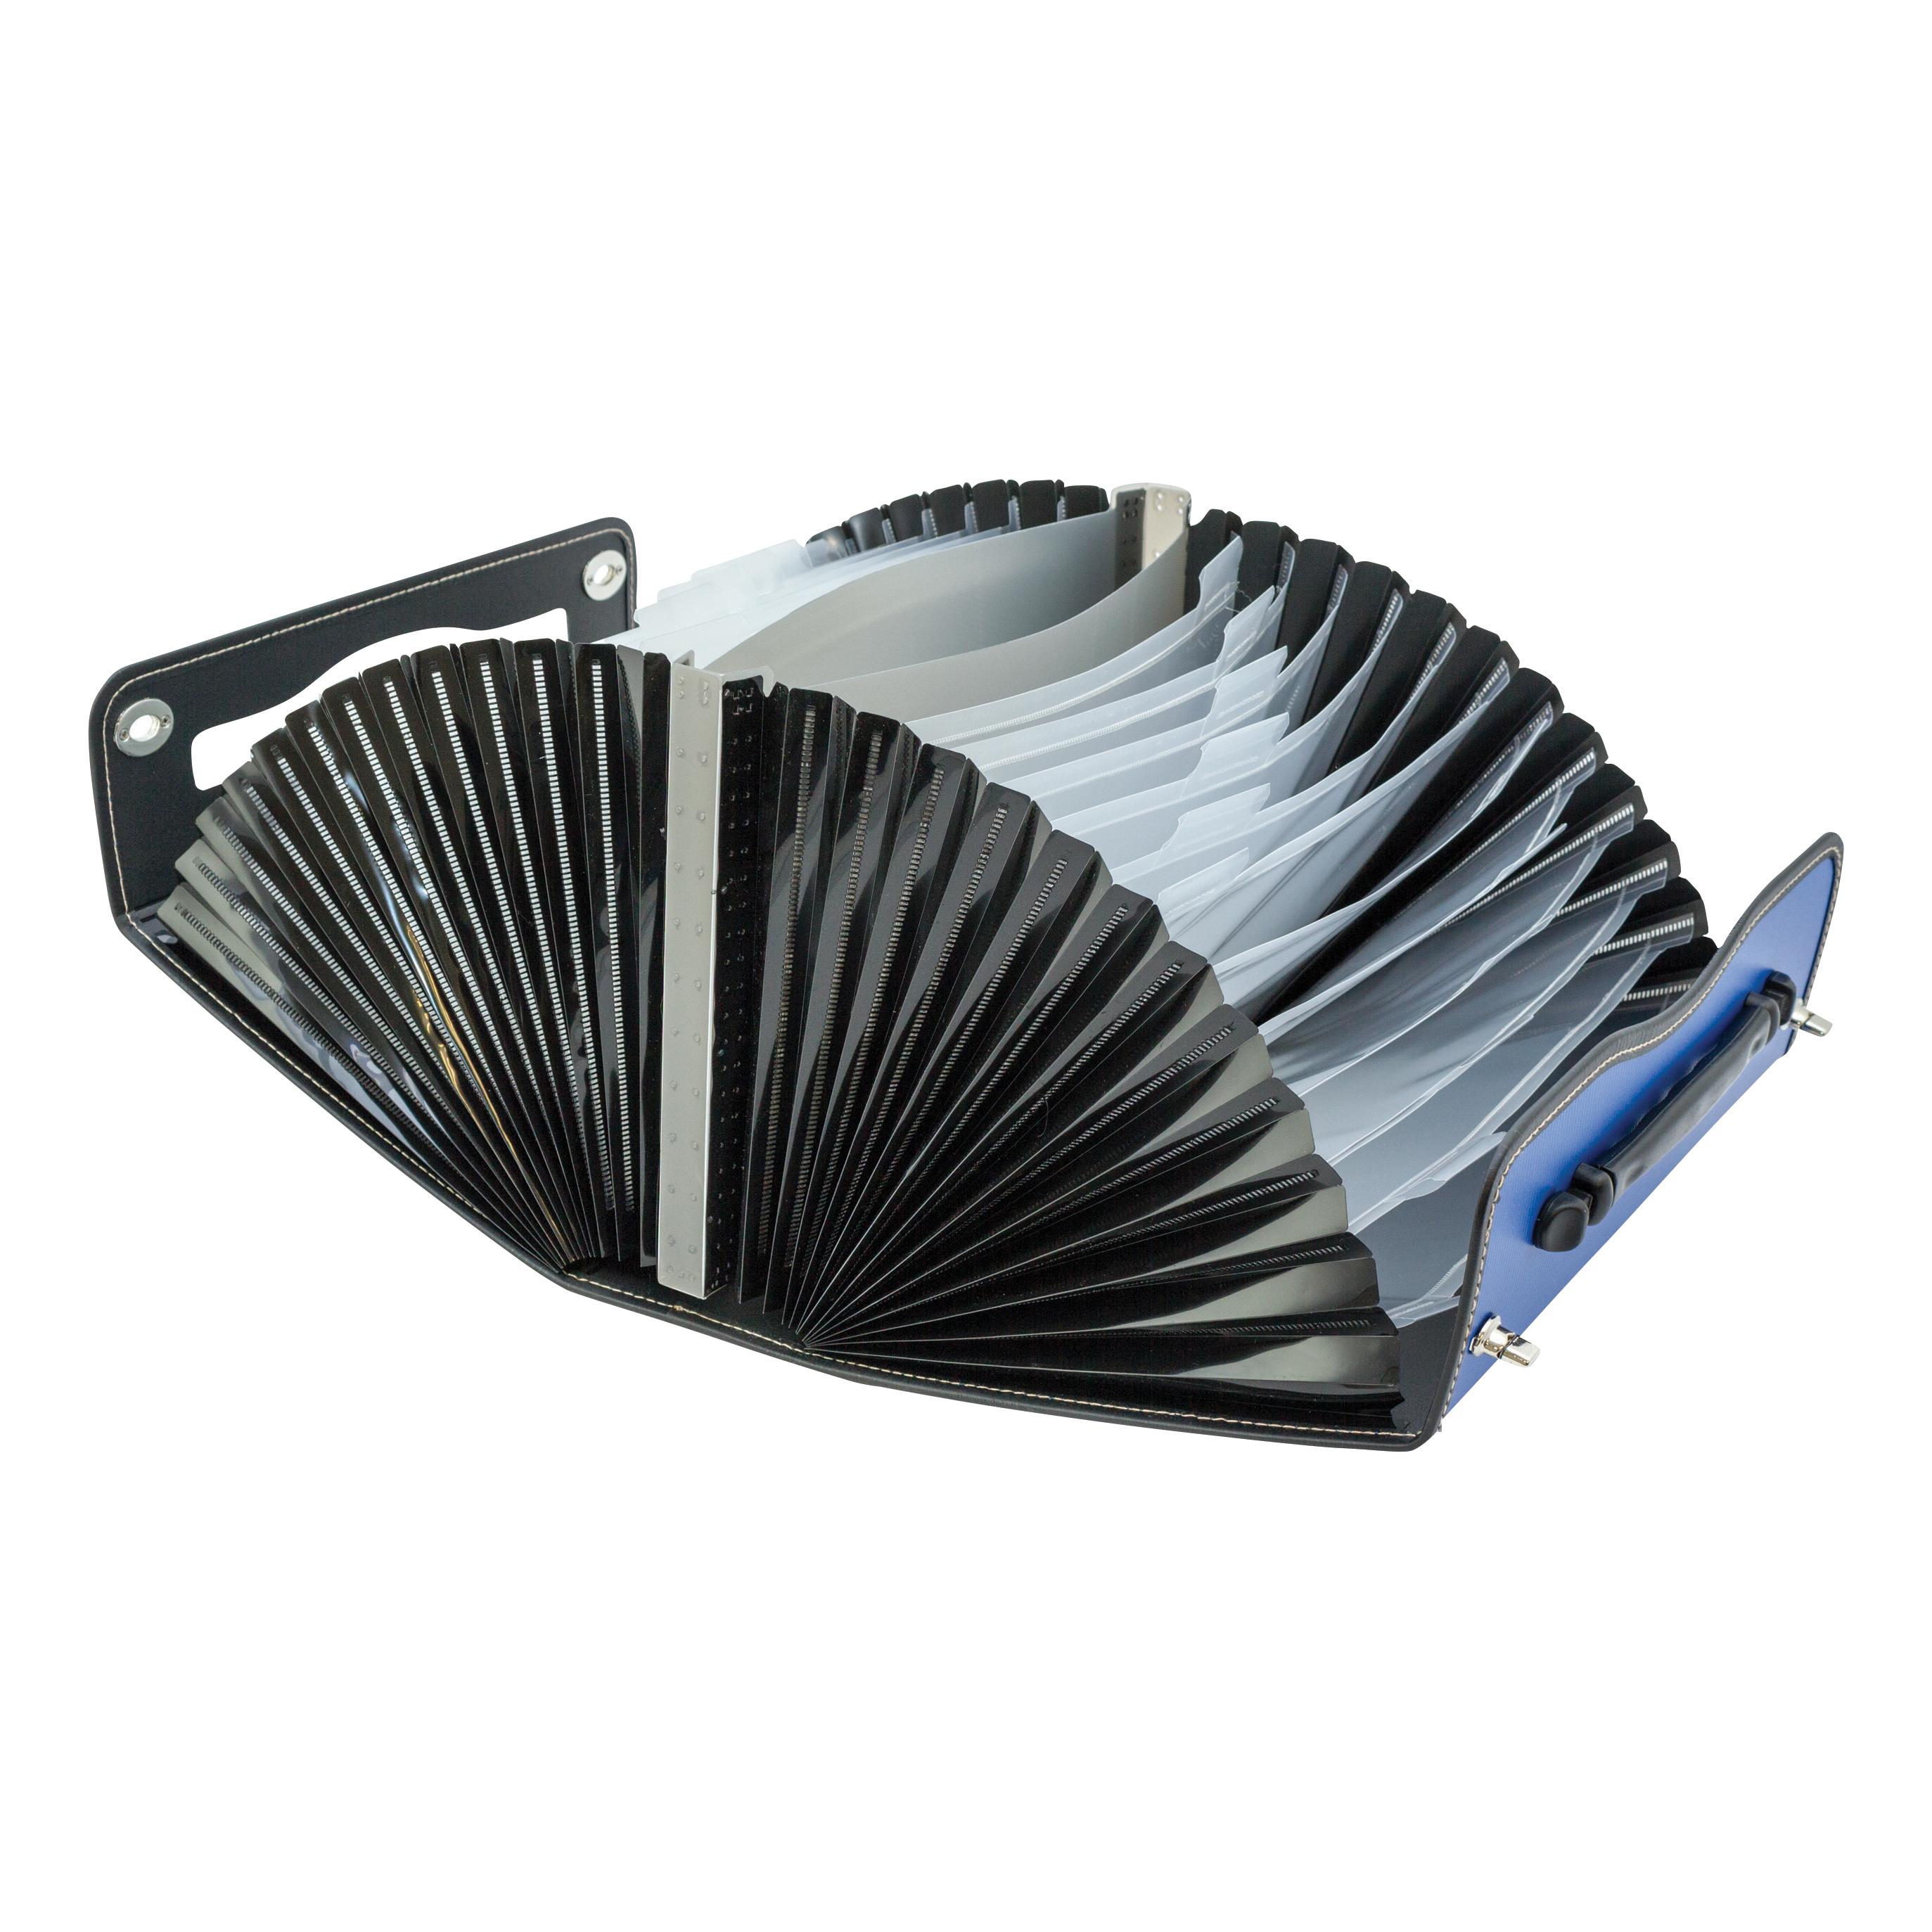 Concord Filing Case Polypropylene 26 Part Metal Twist-lock Foolscap Blue Ref 7107-PFL